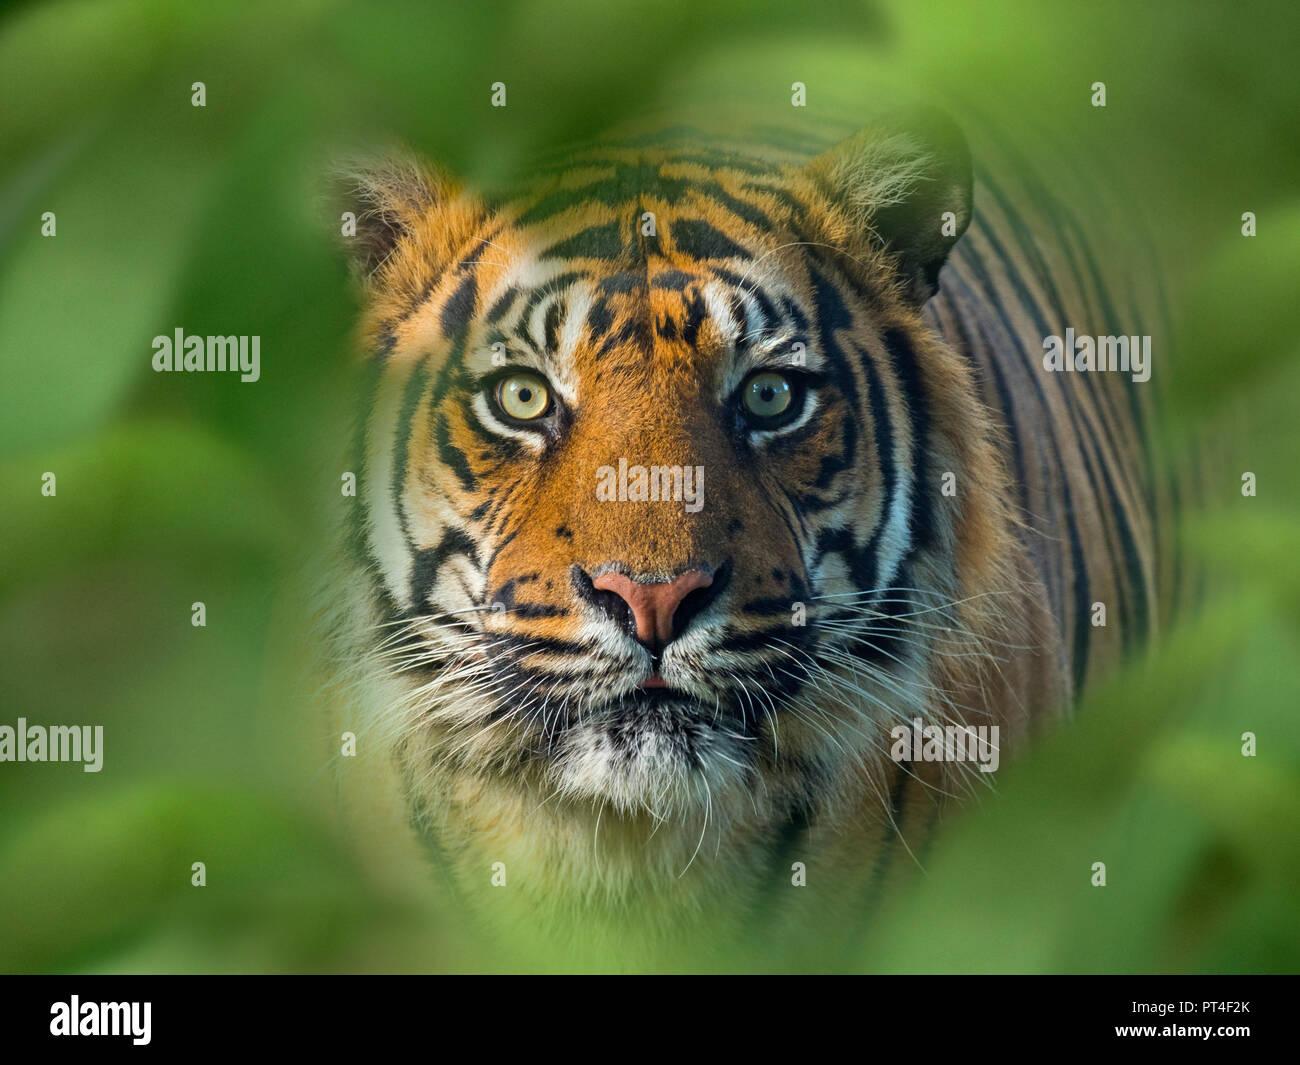 Tigre de Sumatra Panthera tigris sondaica cautivo Foto de stock